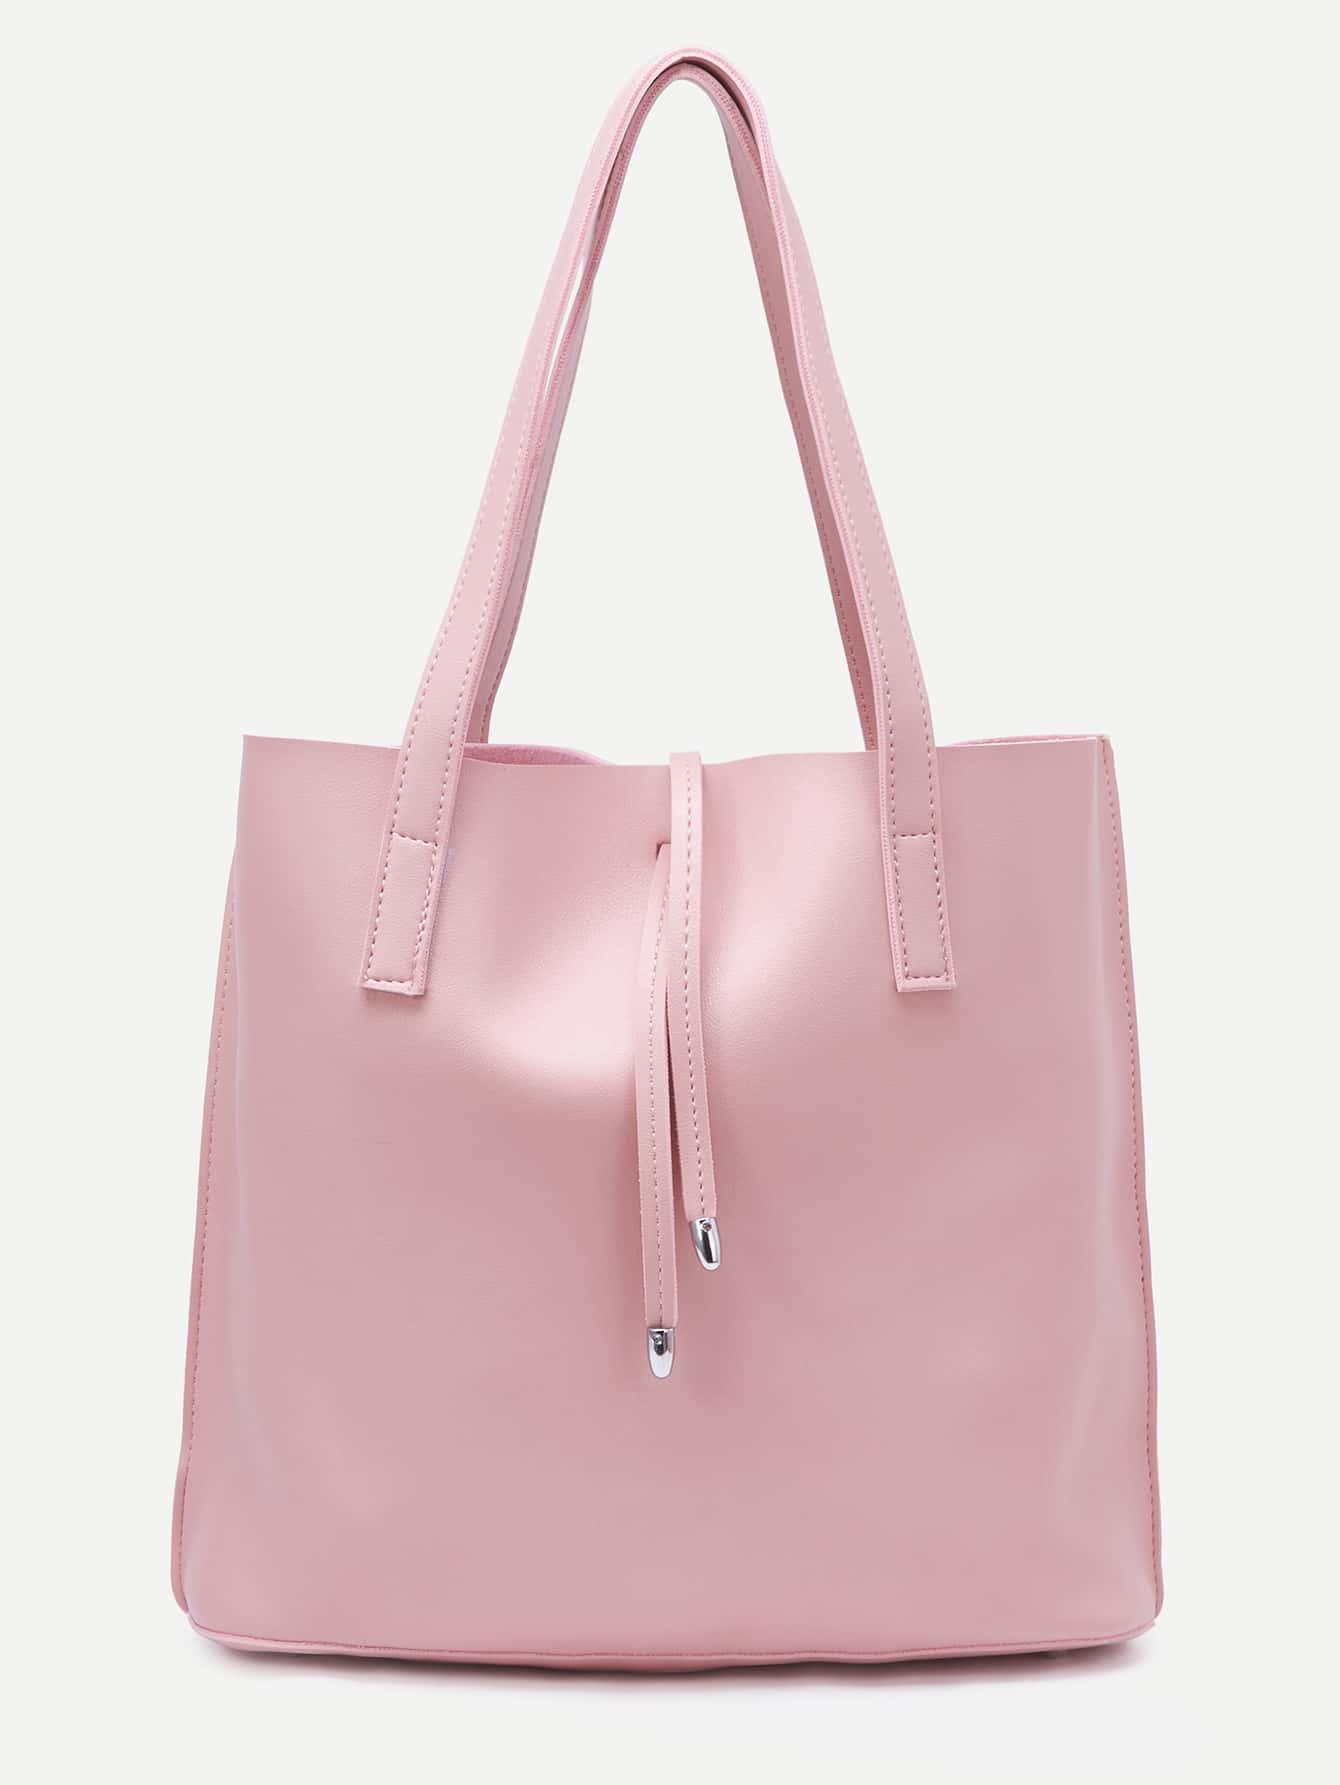 bag160818911_2